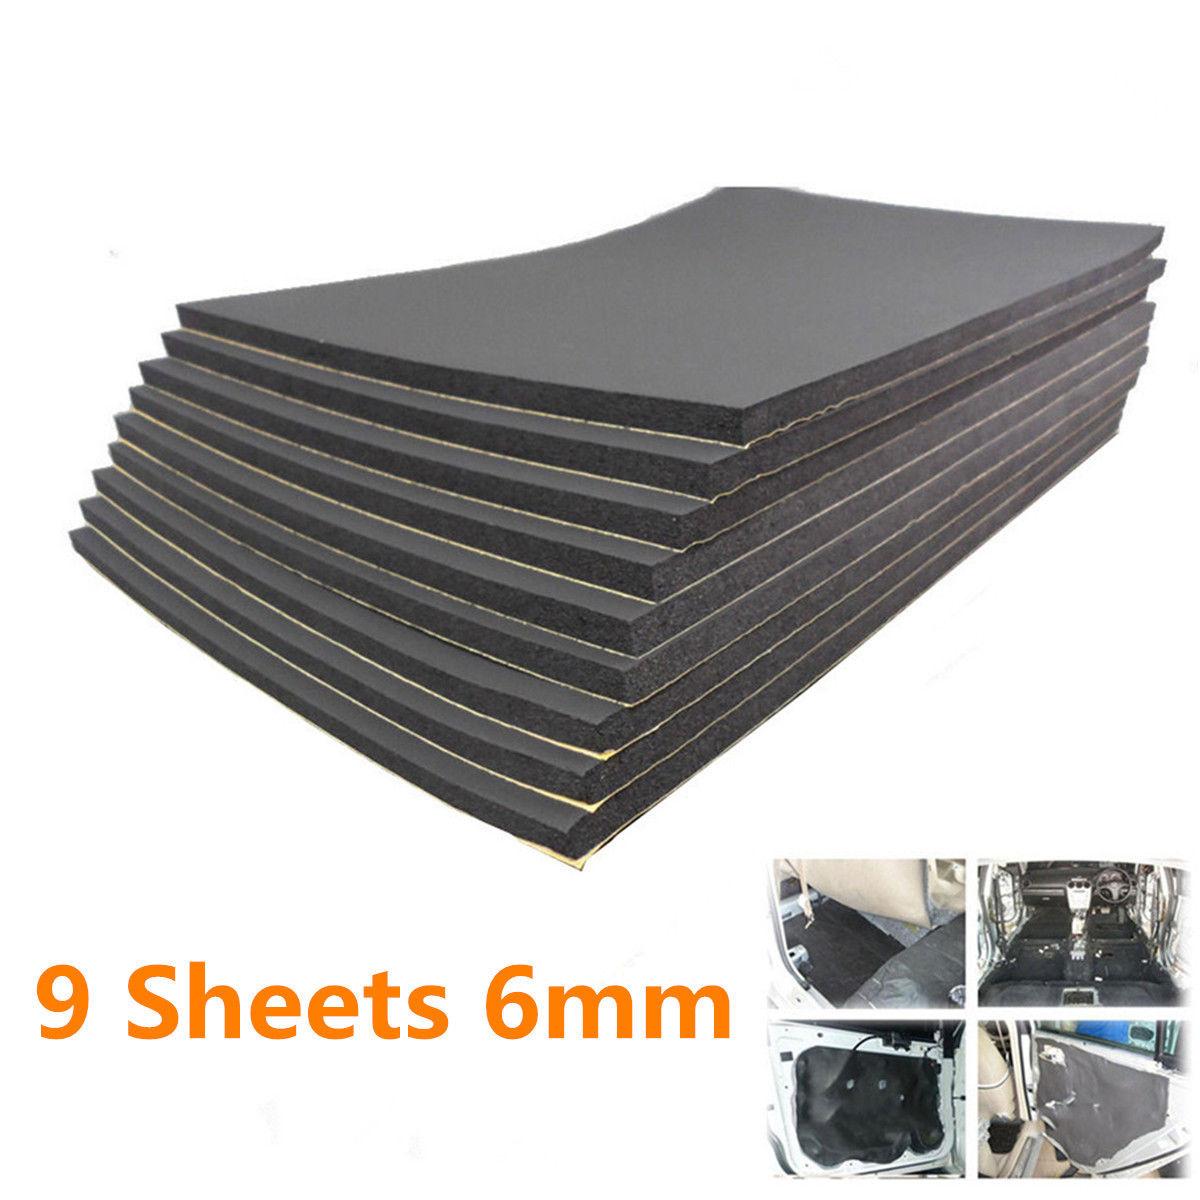 9pcs Car Van Sound Proofing Deadening Insulation Foam New 30cm*50cm*6mm Protector Auto Sound Insulation Deadening Accessories